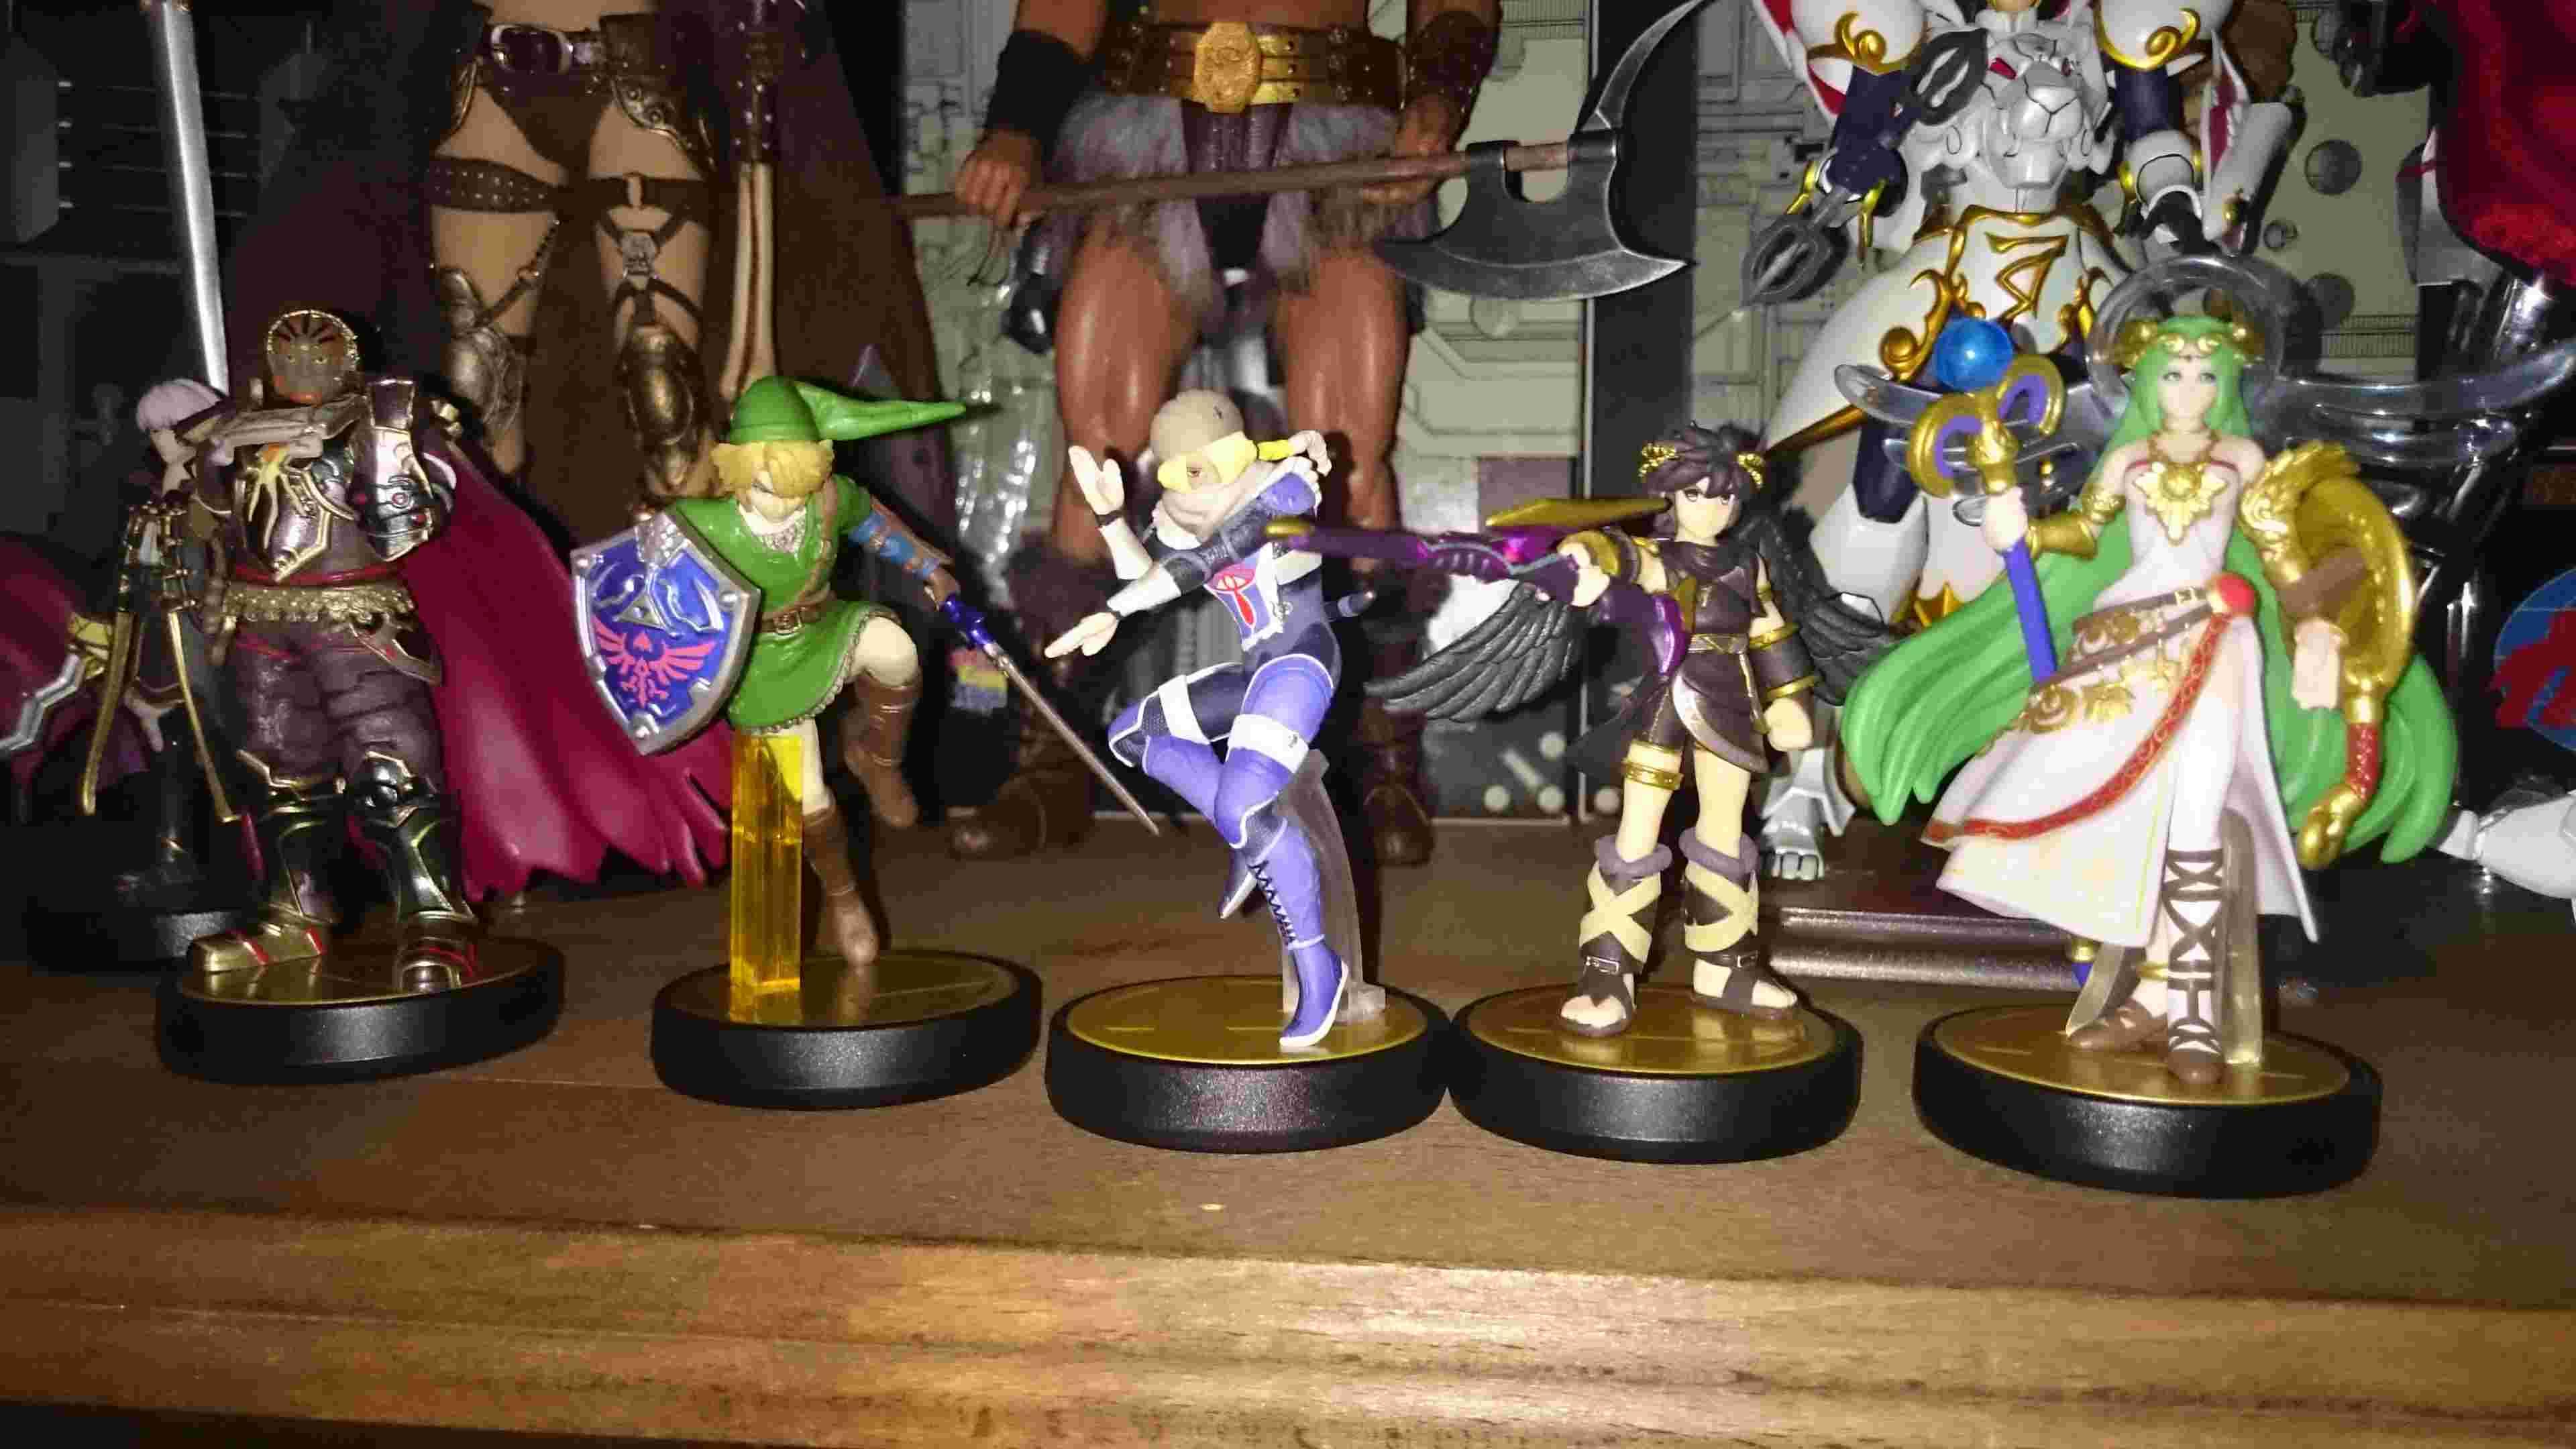 Postez vos photos figurines Nintendo WiiU Amiibo ! Amiibo14